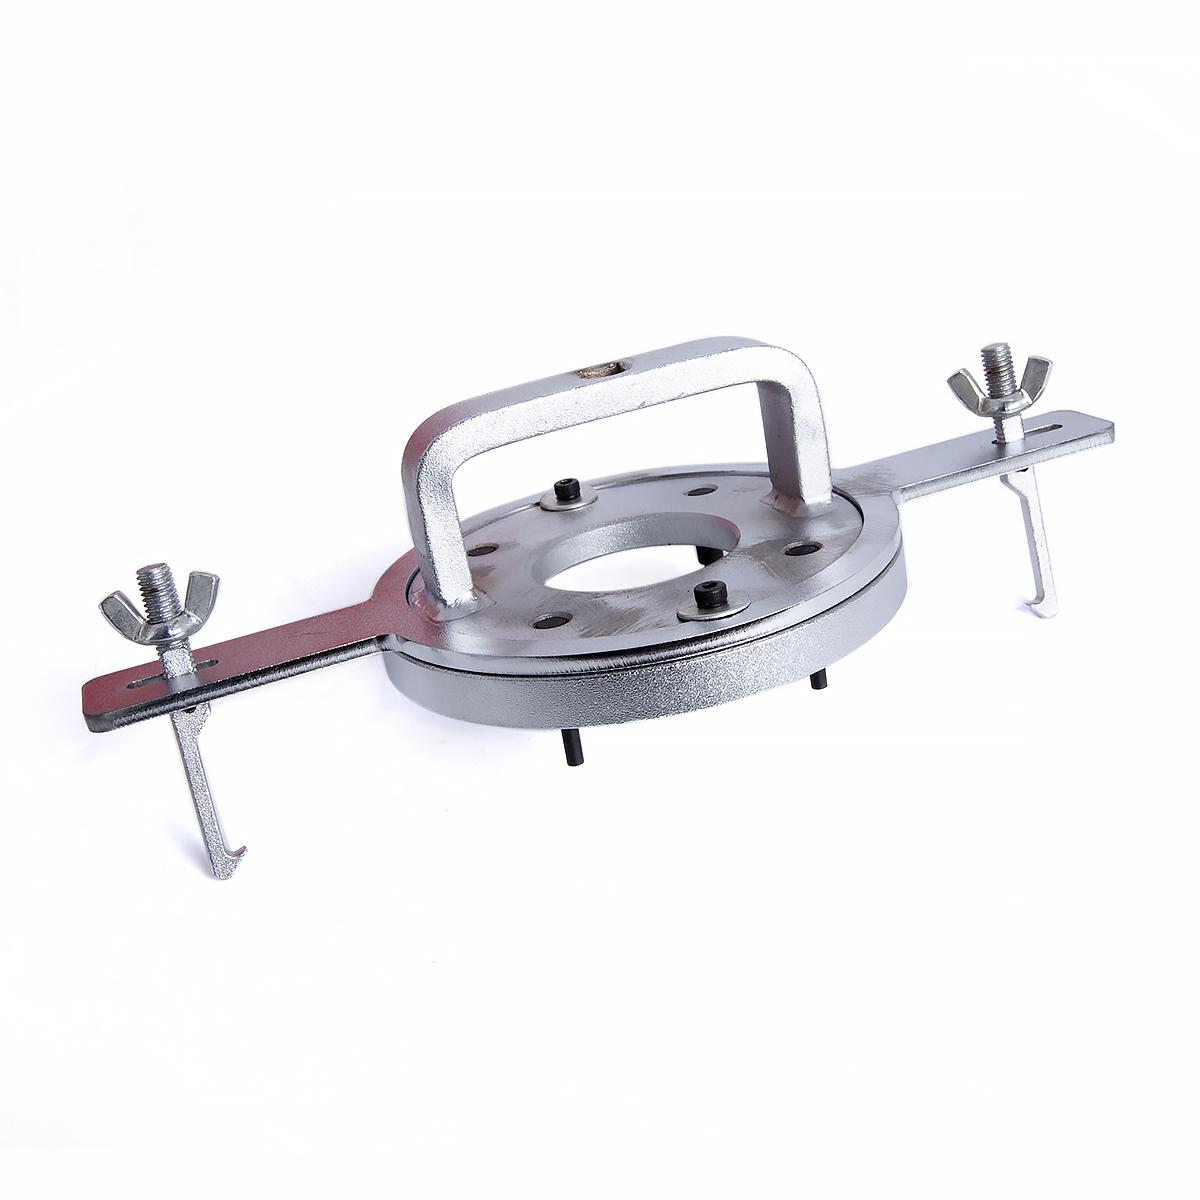 Набор инструмента для замены двойного сцепления VOLVO/FORD/CHRYSLER/DODGE Car-Tool CT-A163...